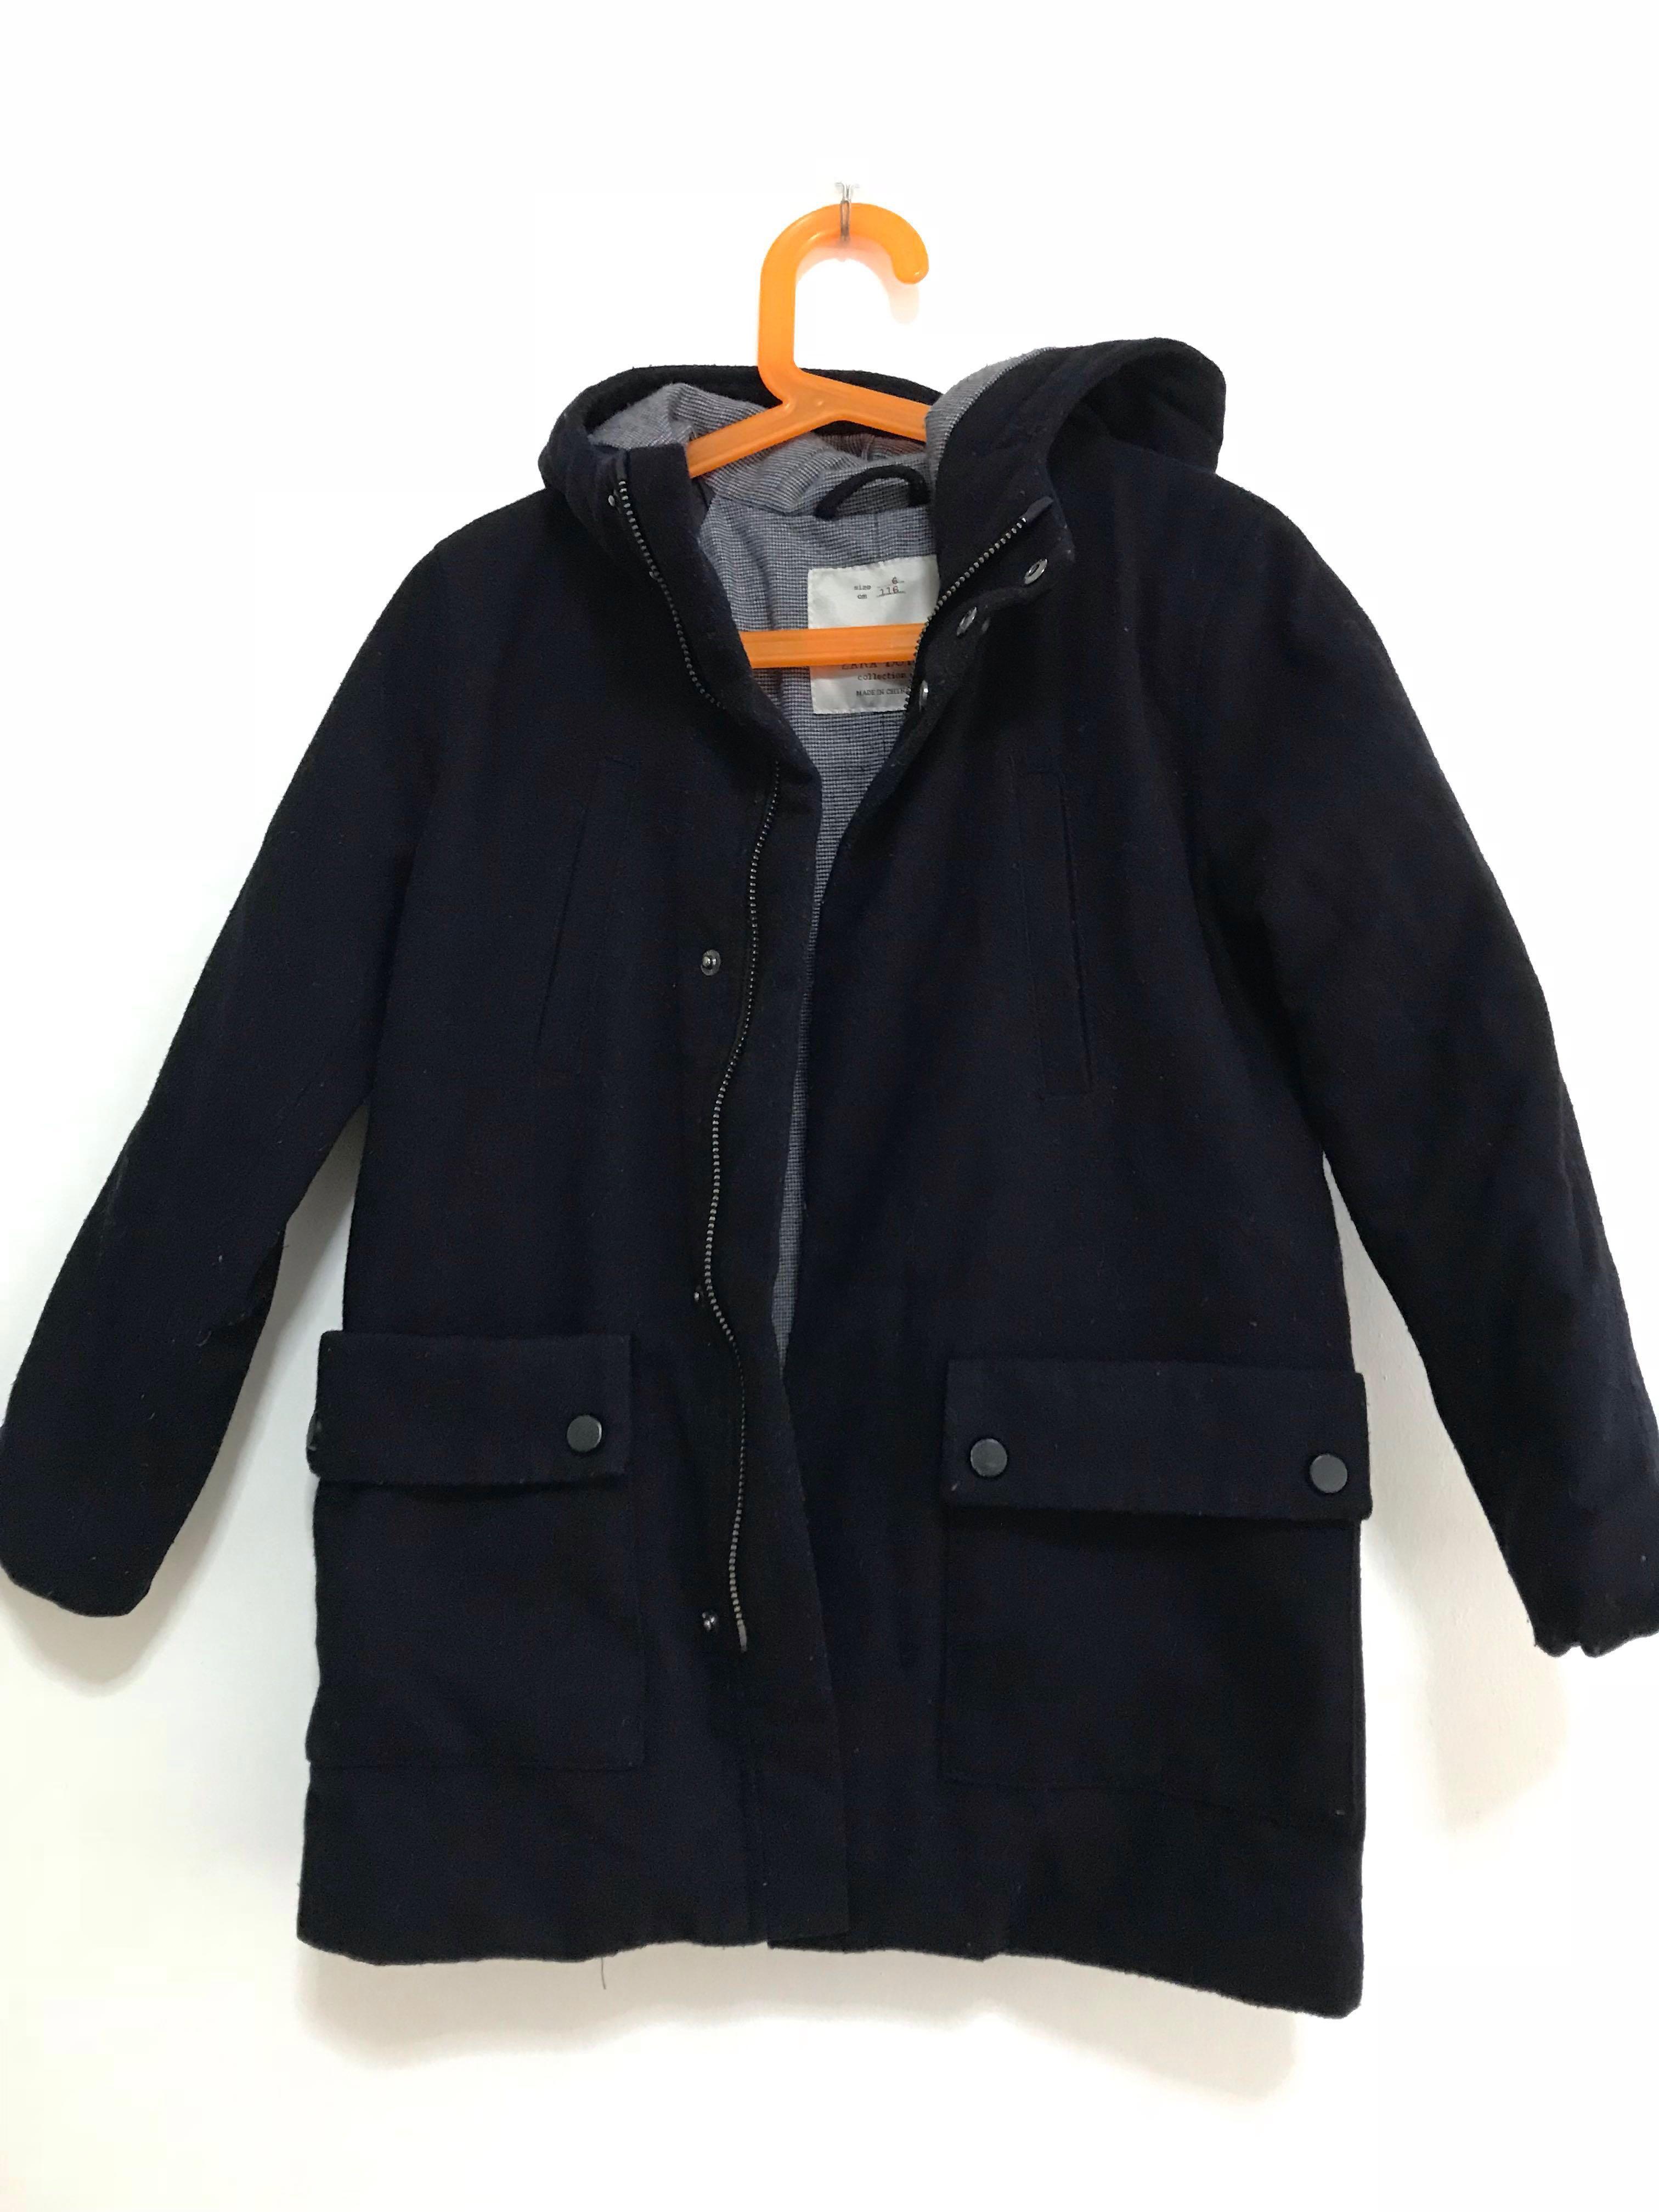 054ca162 Preloved Zara Boys Winter Coat, Babies & Kids, Boys' Apparel, 4 to 7 Years  on Carousell